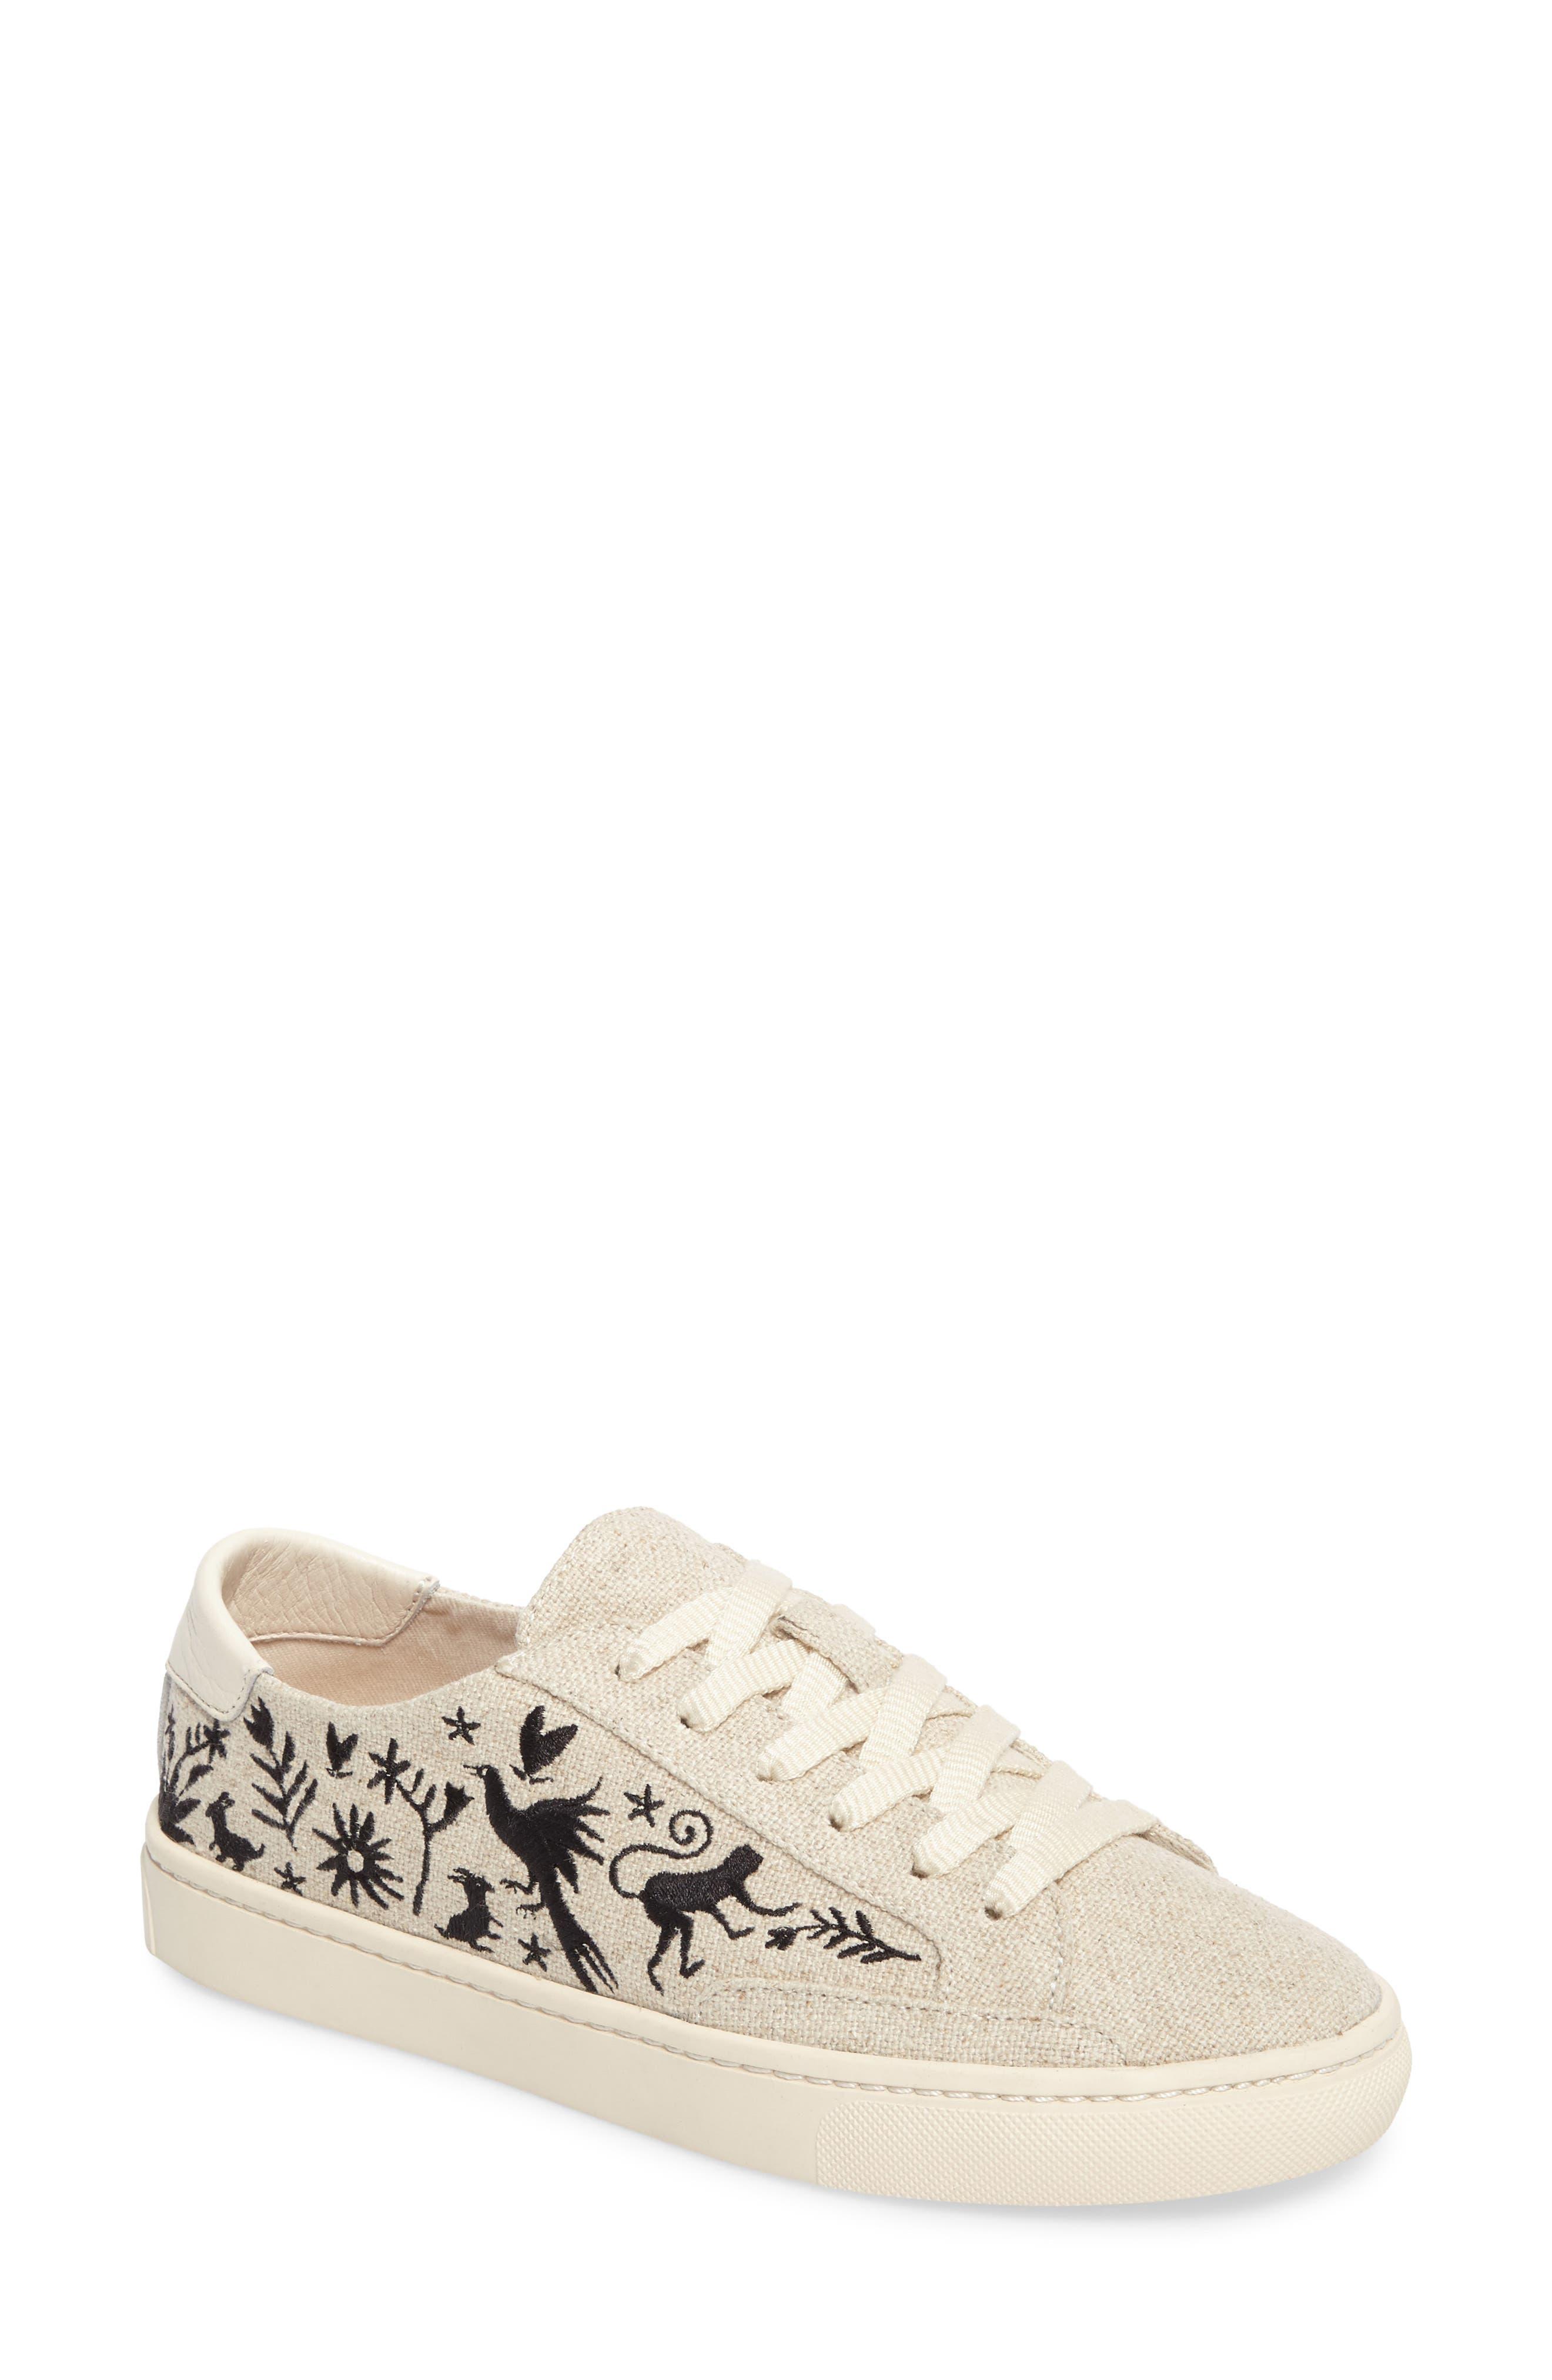 Otomi Sneaker,                             Main thumbnail 1, color,